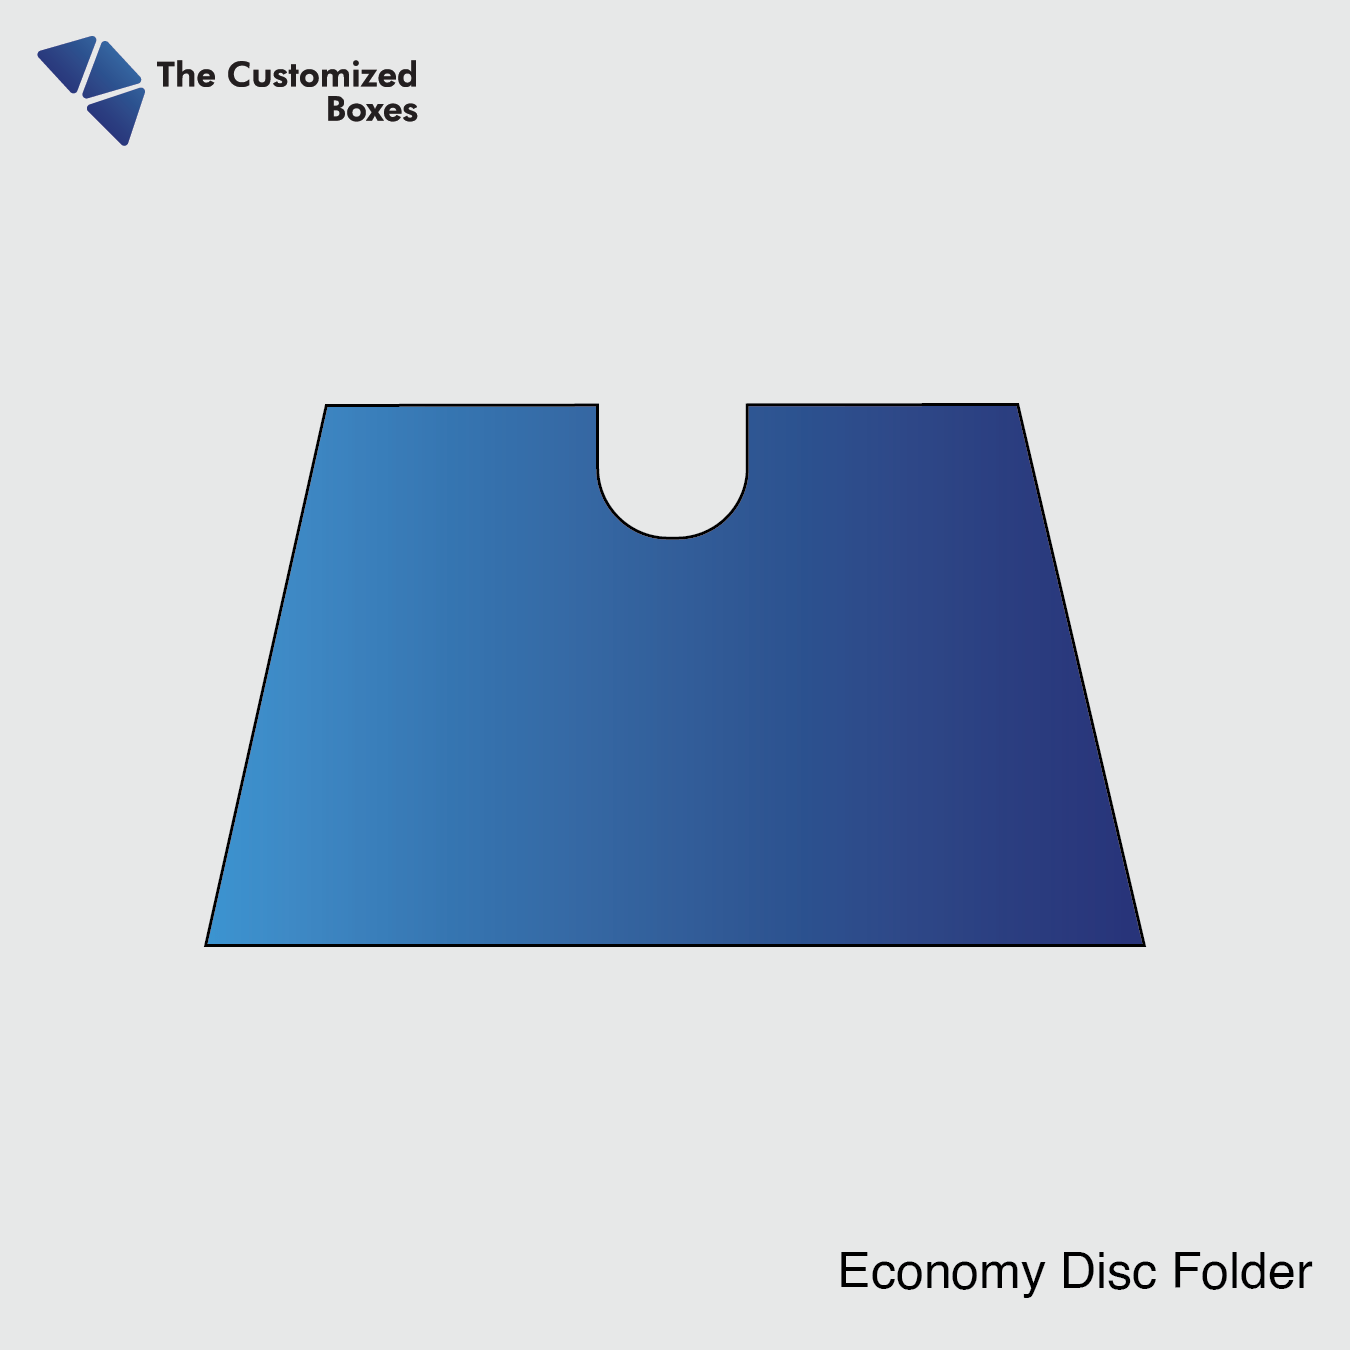 Economy Disc Folder (2)